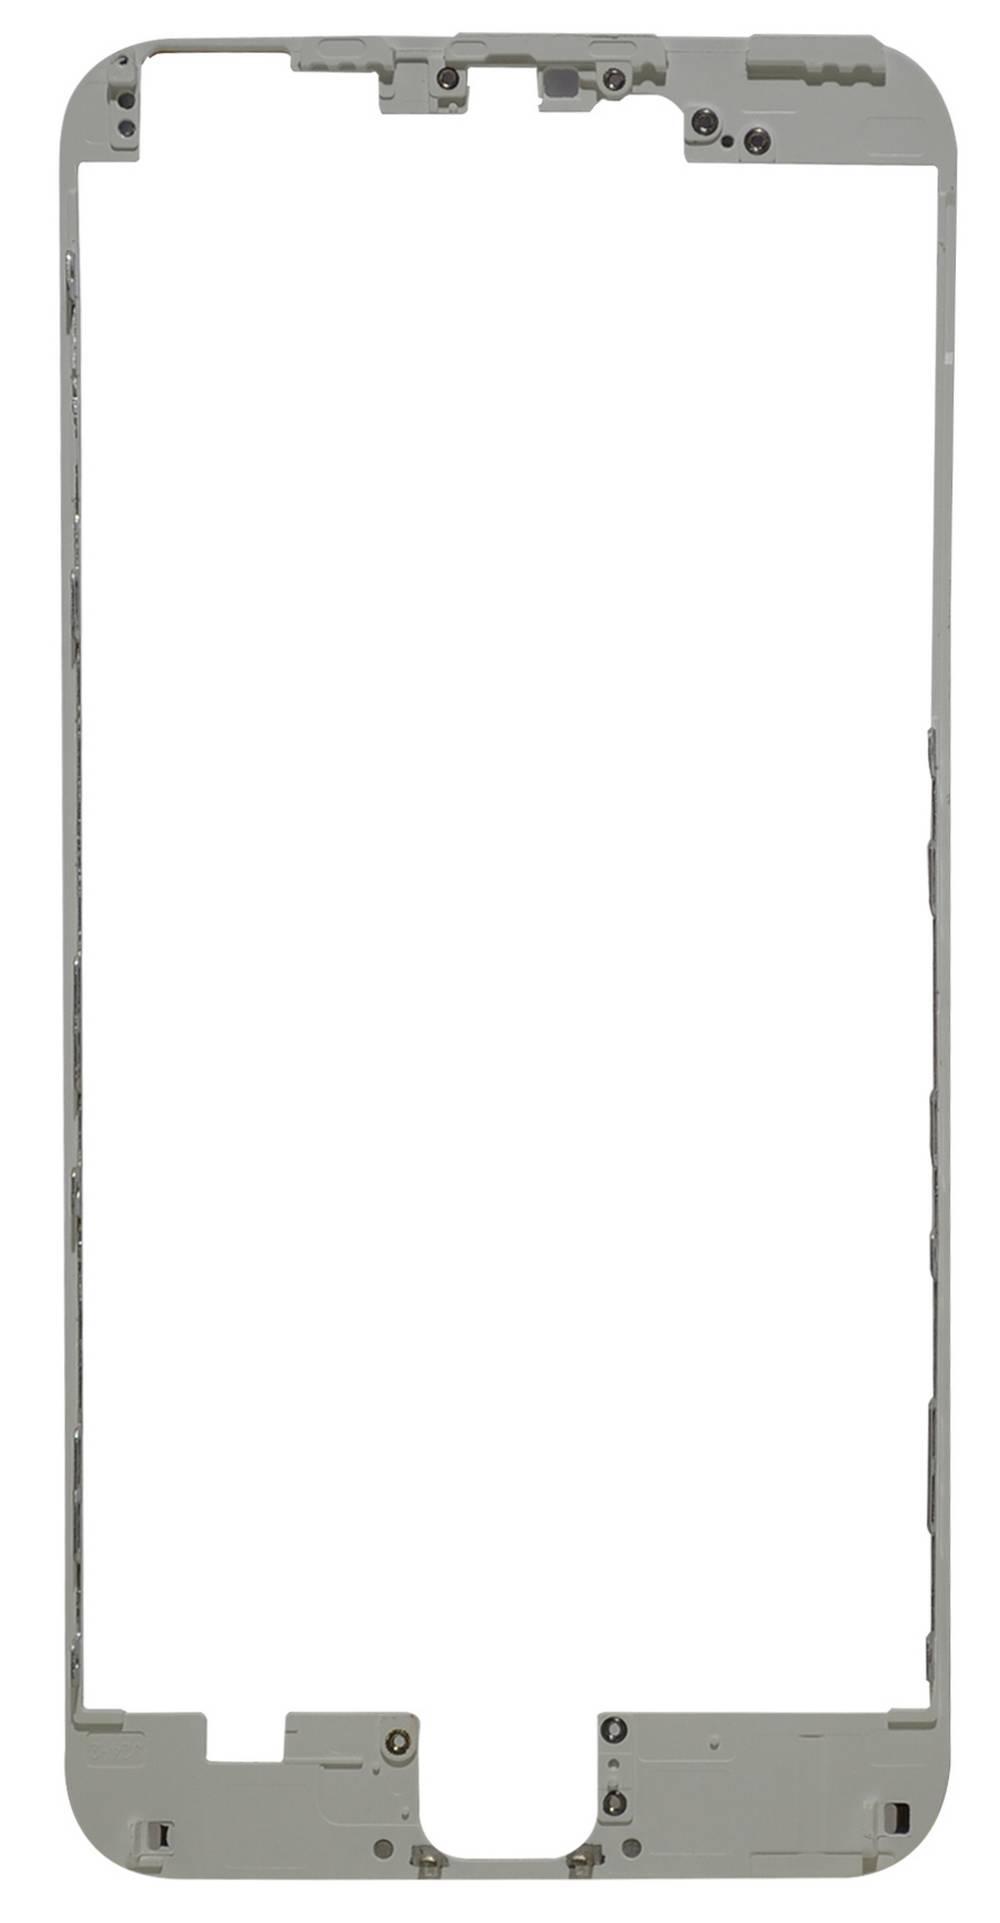 Gasket Οθόνης Apple iPhone 6 Plus Λευκό OEM Type A